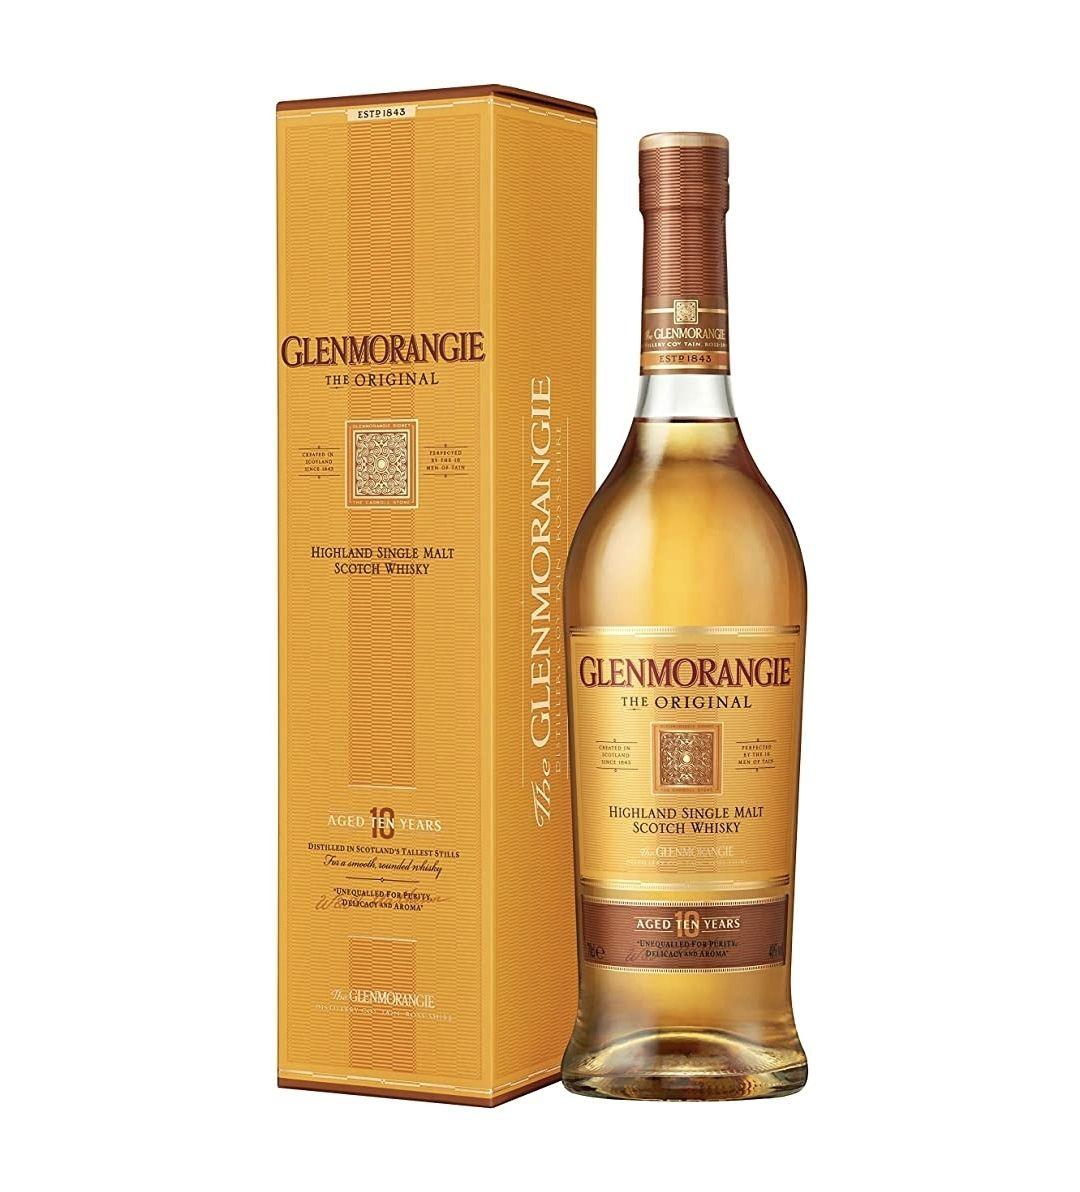 Glenmorangie Highland Single Malt 10yr Scotch Whisky £25 at Amazon